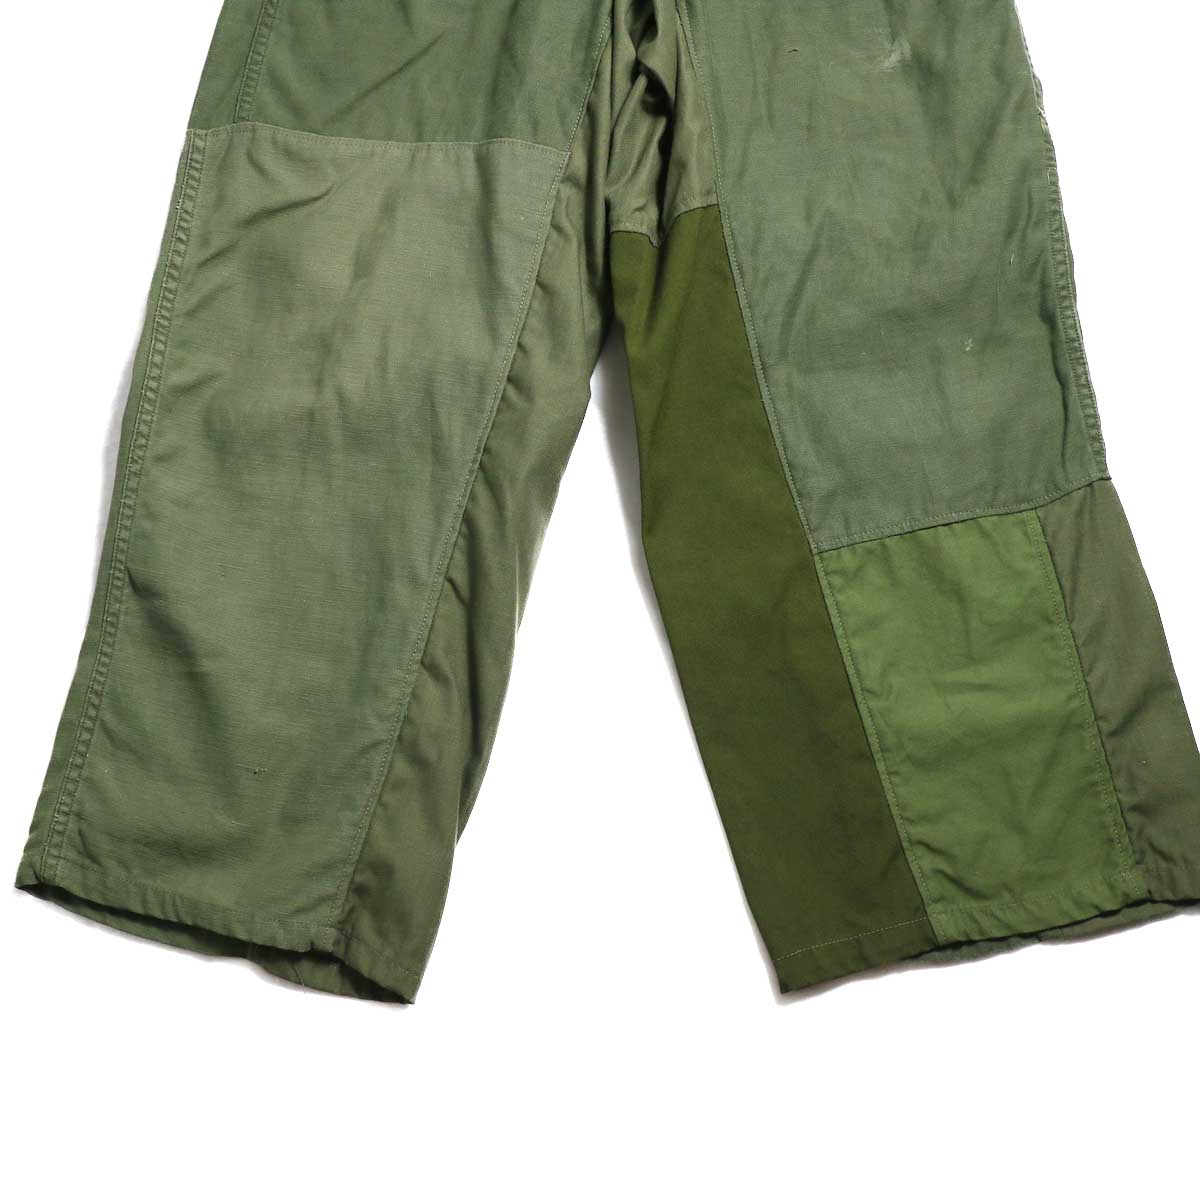 BONUM / Military FAT Pants (A) 股下